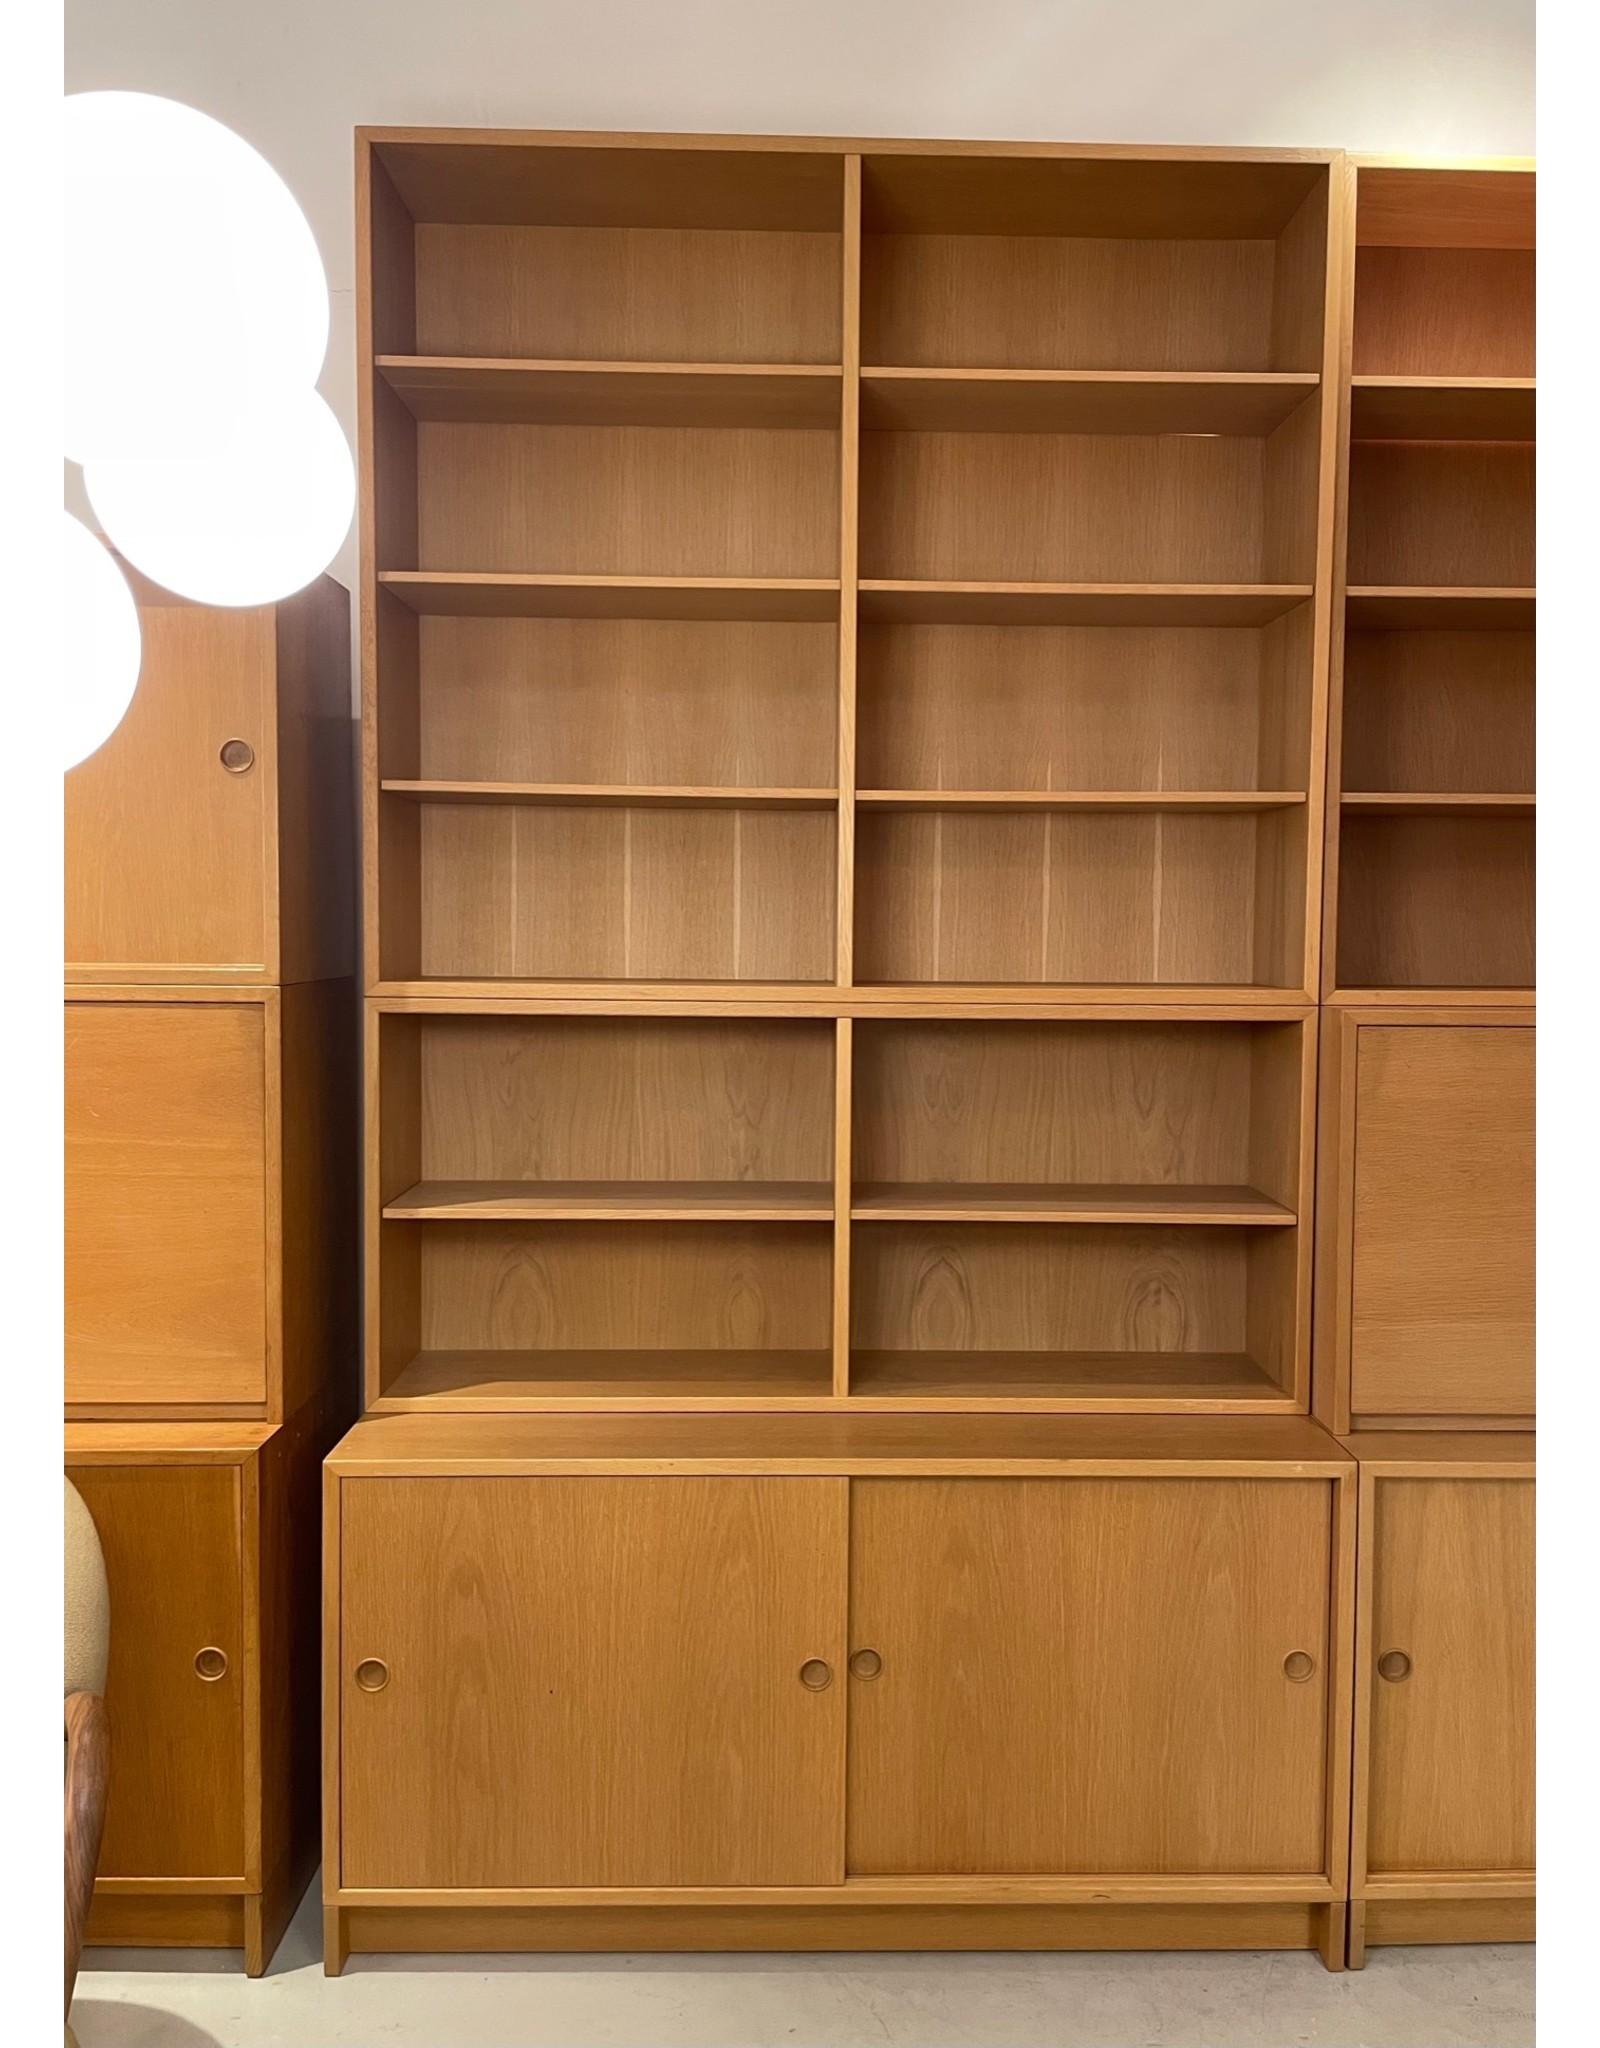 1960's ORESUND OAK BOOKCASE